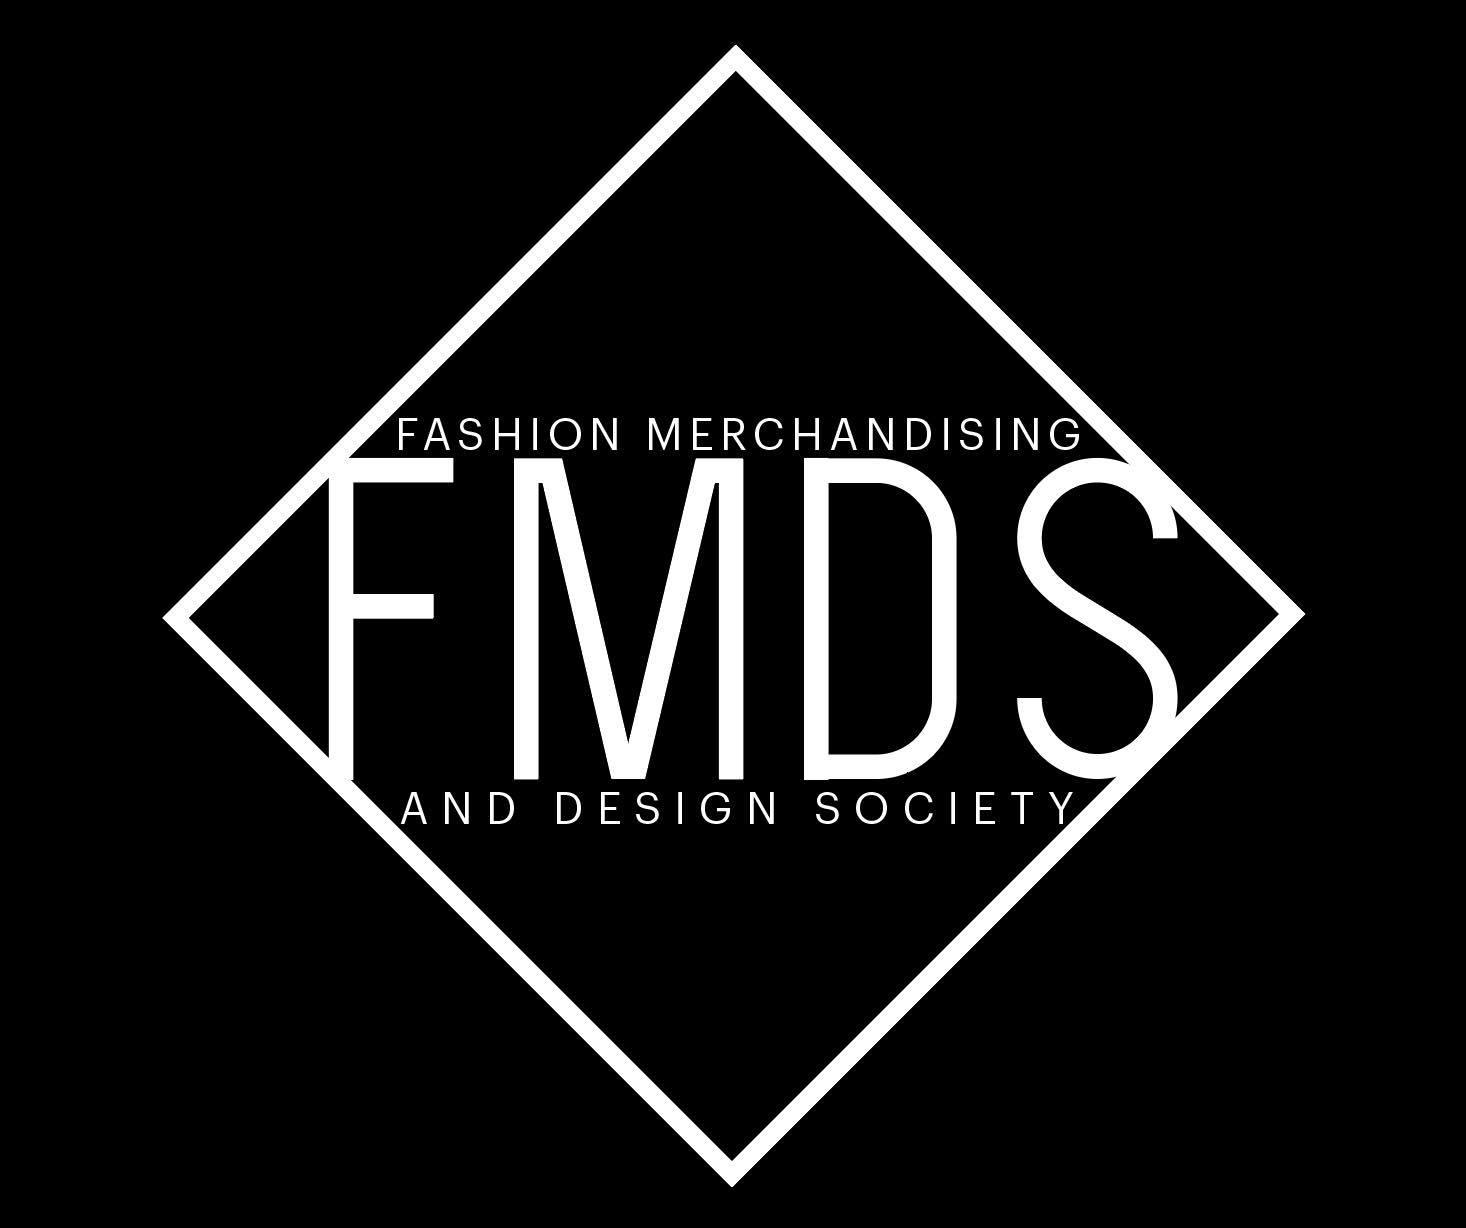 Fashion merchandising and design society 14